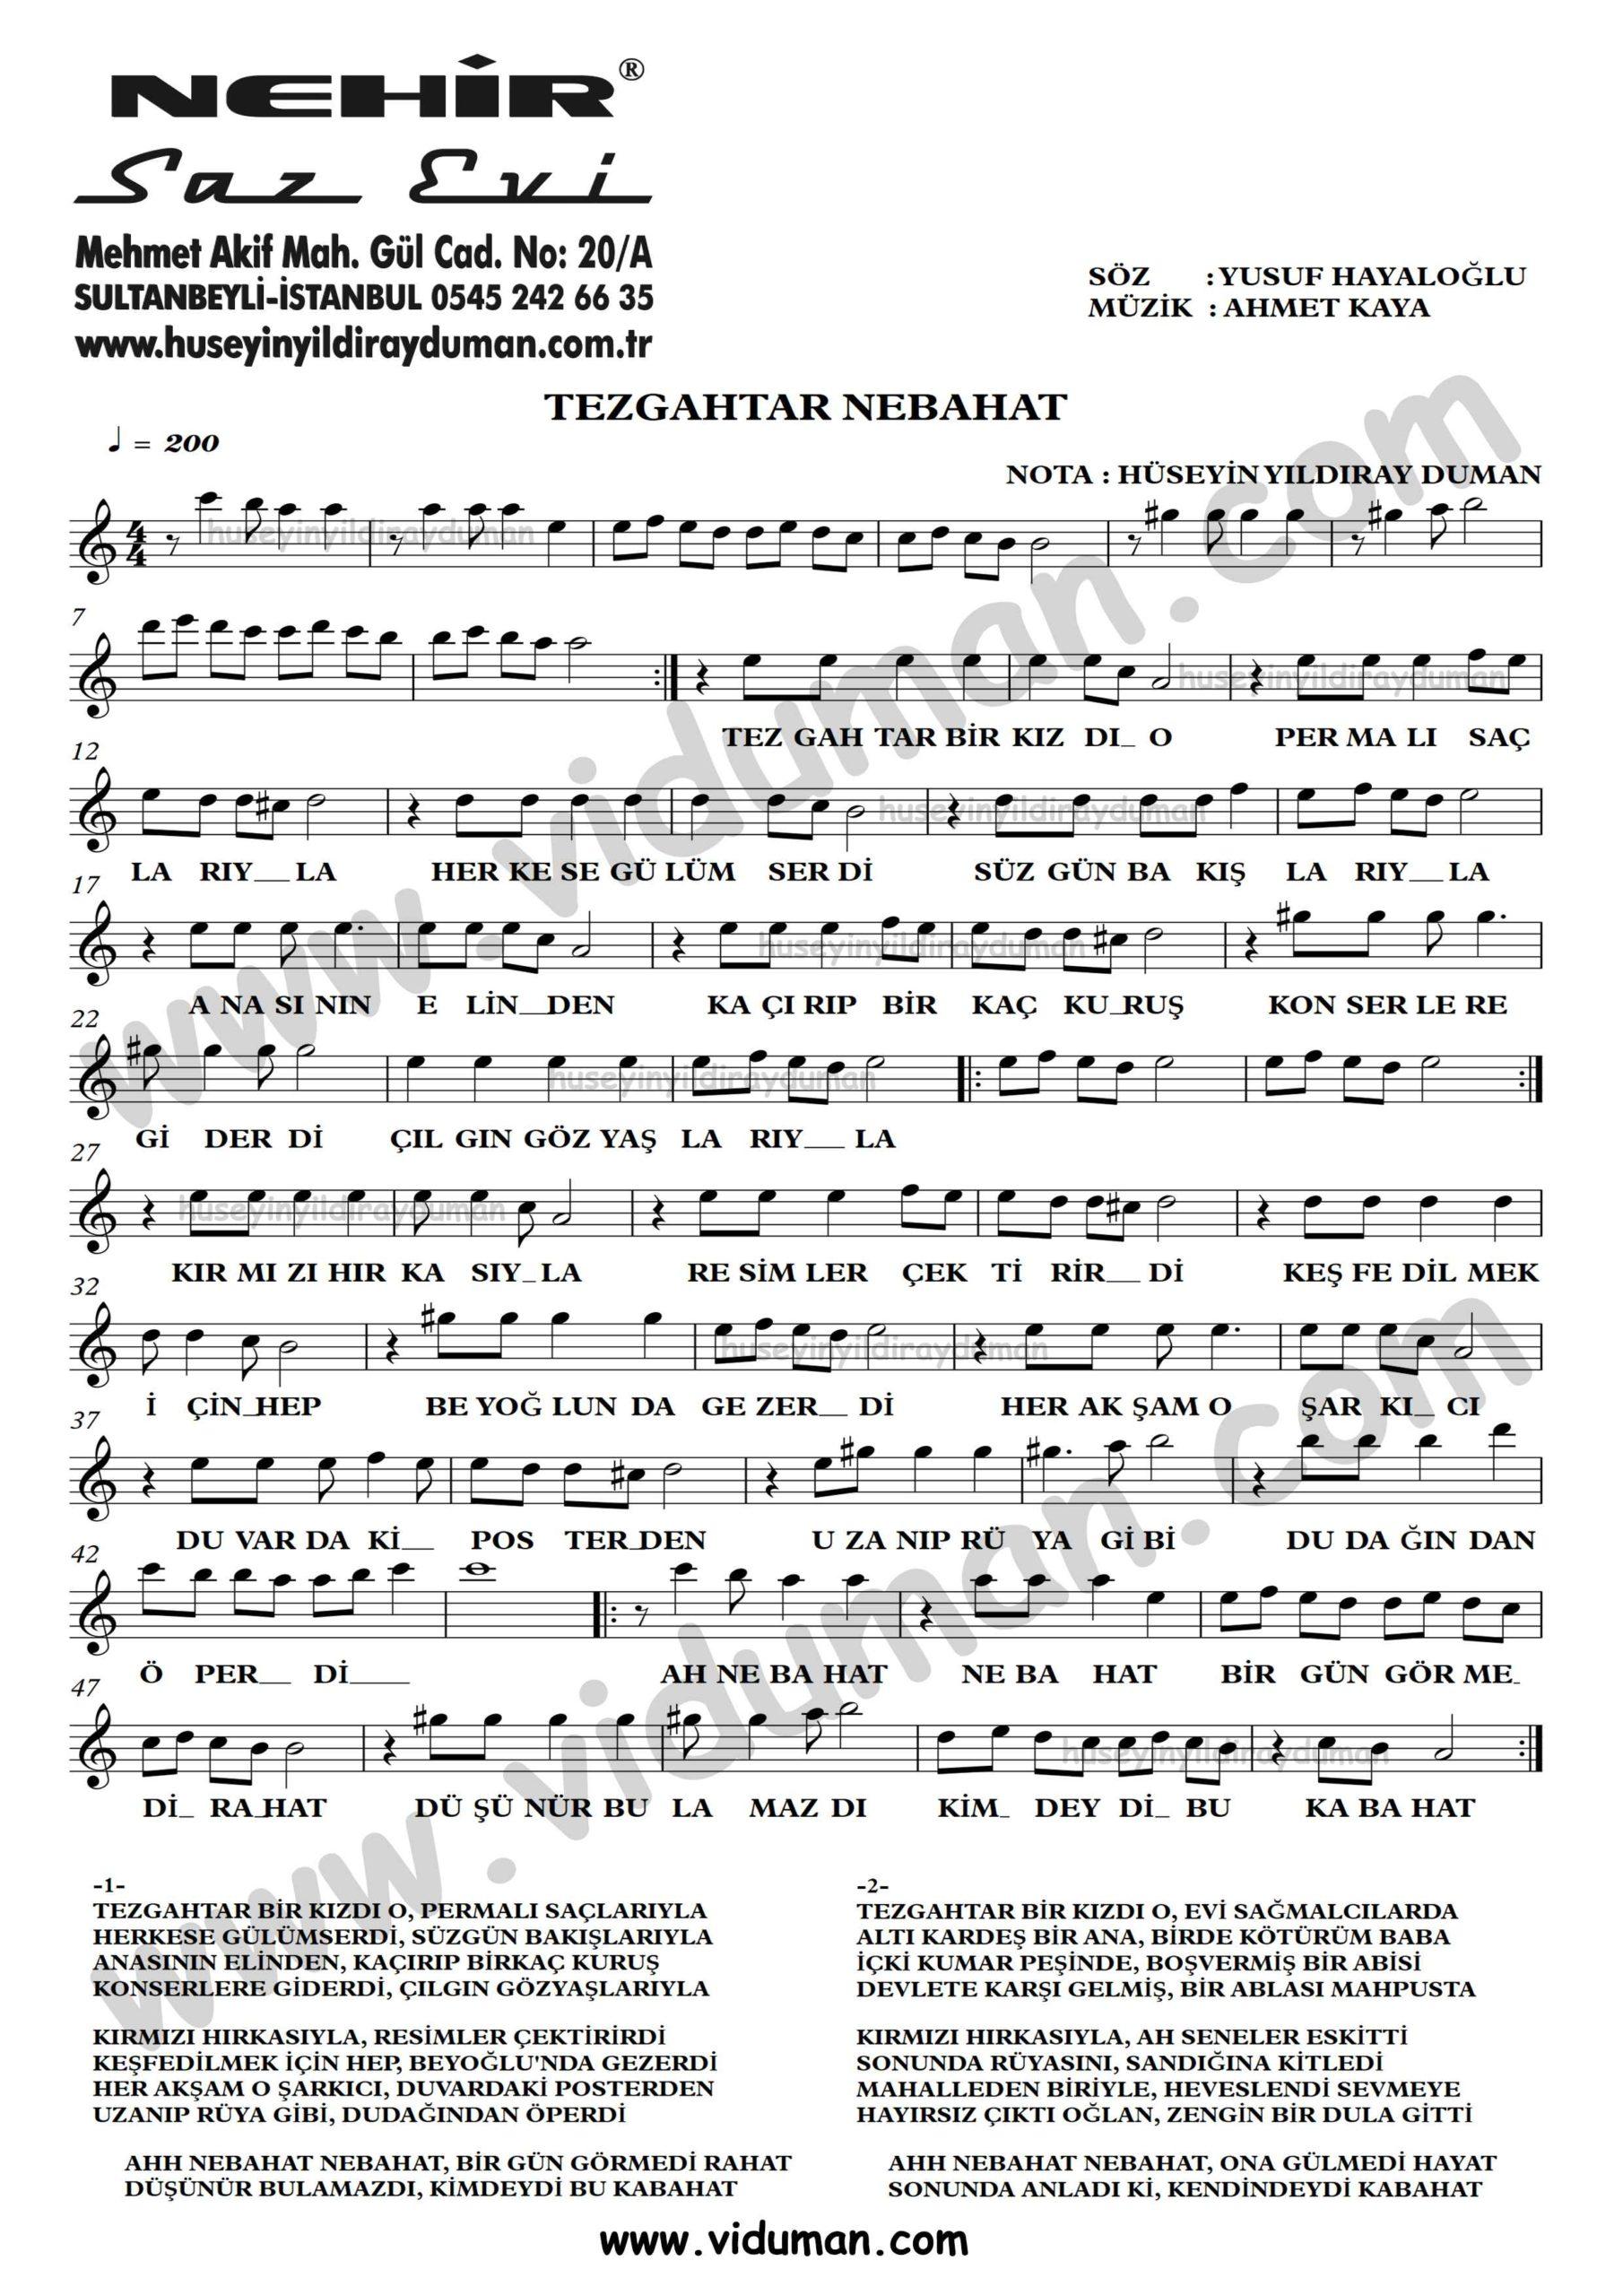 Tezgahtar Nebahat-Ahmet Kaya-Baglama-Saz-Turku-Notalari